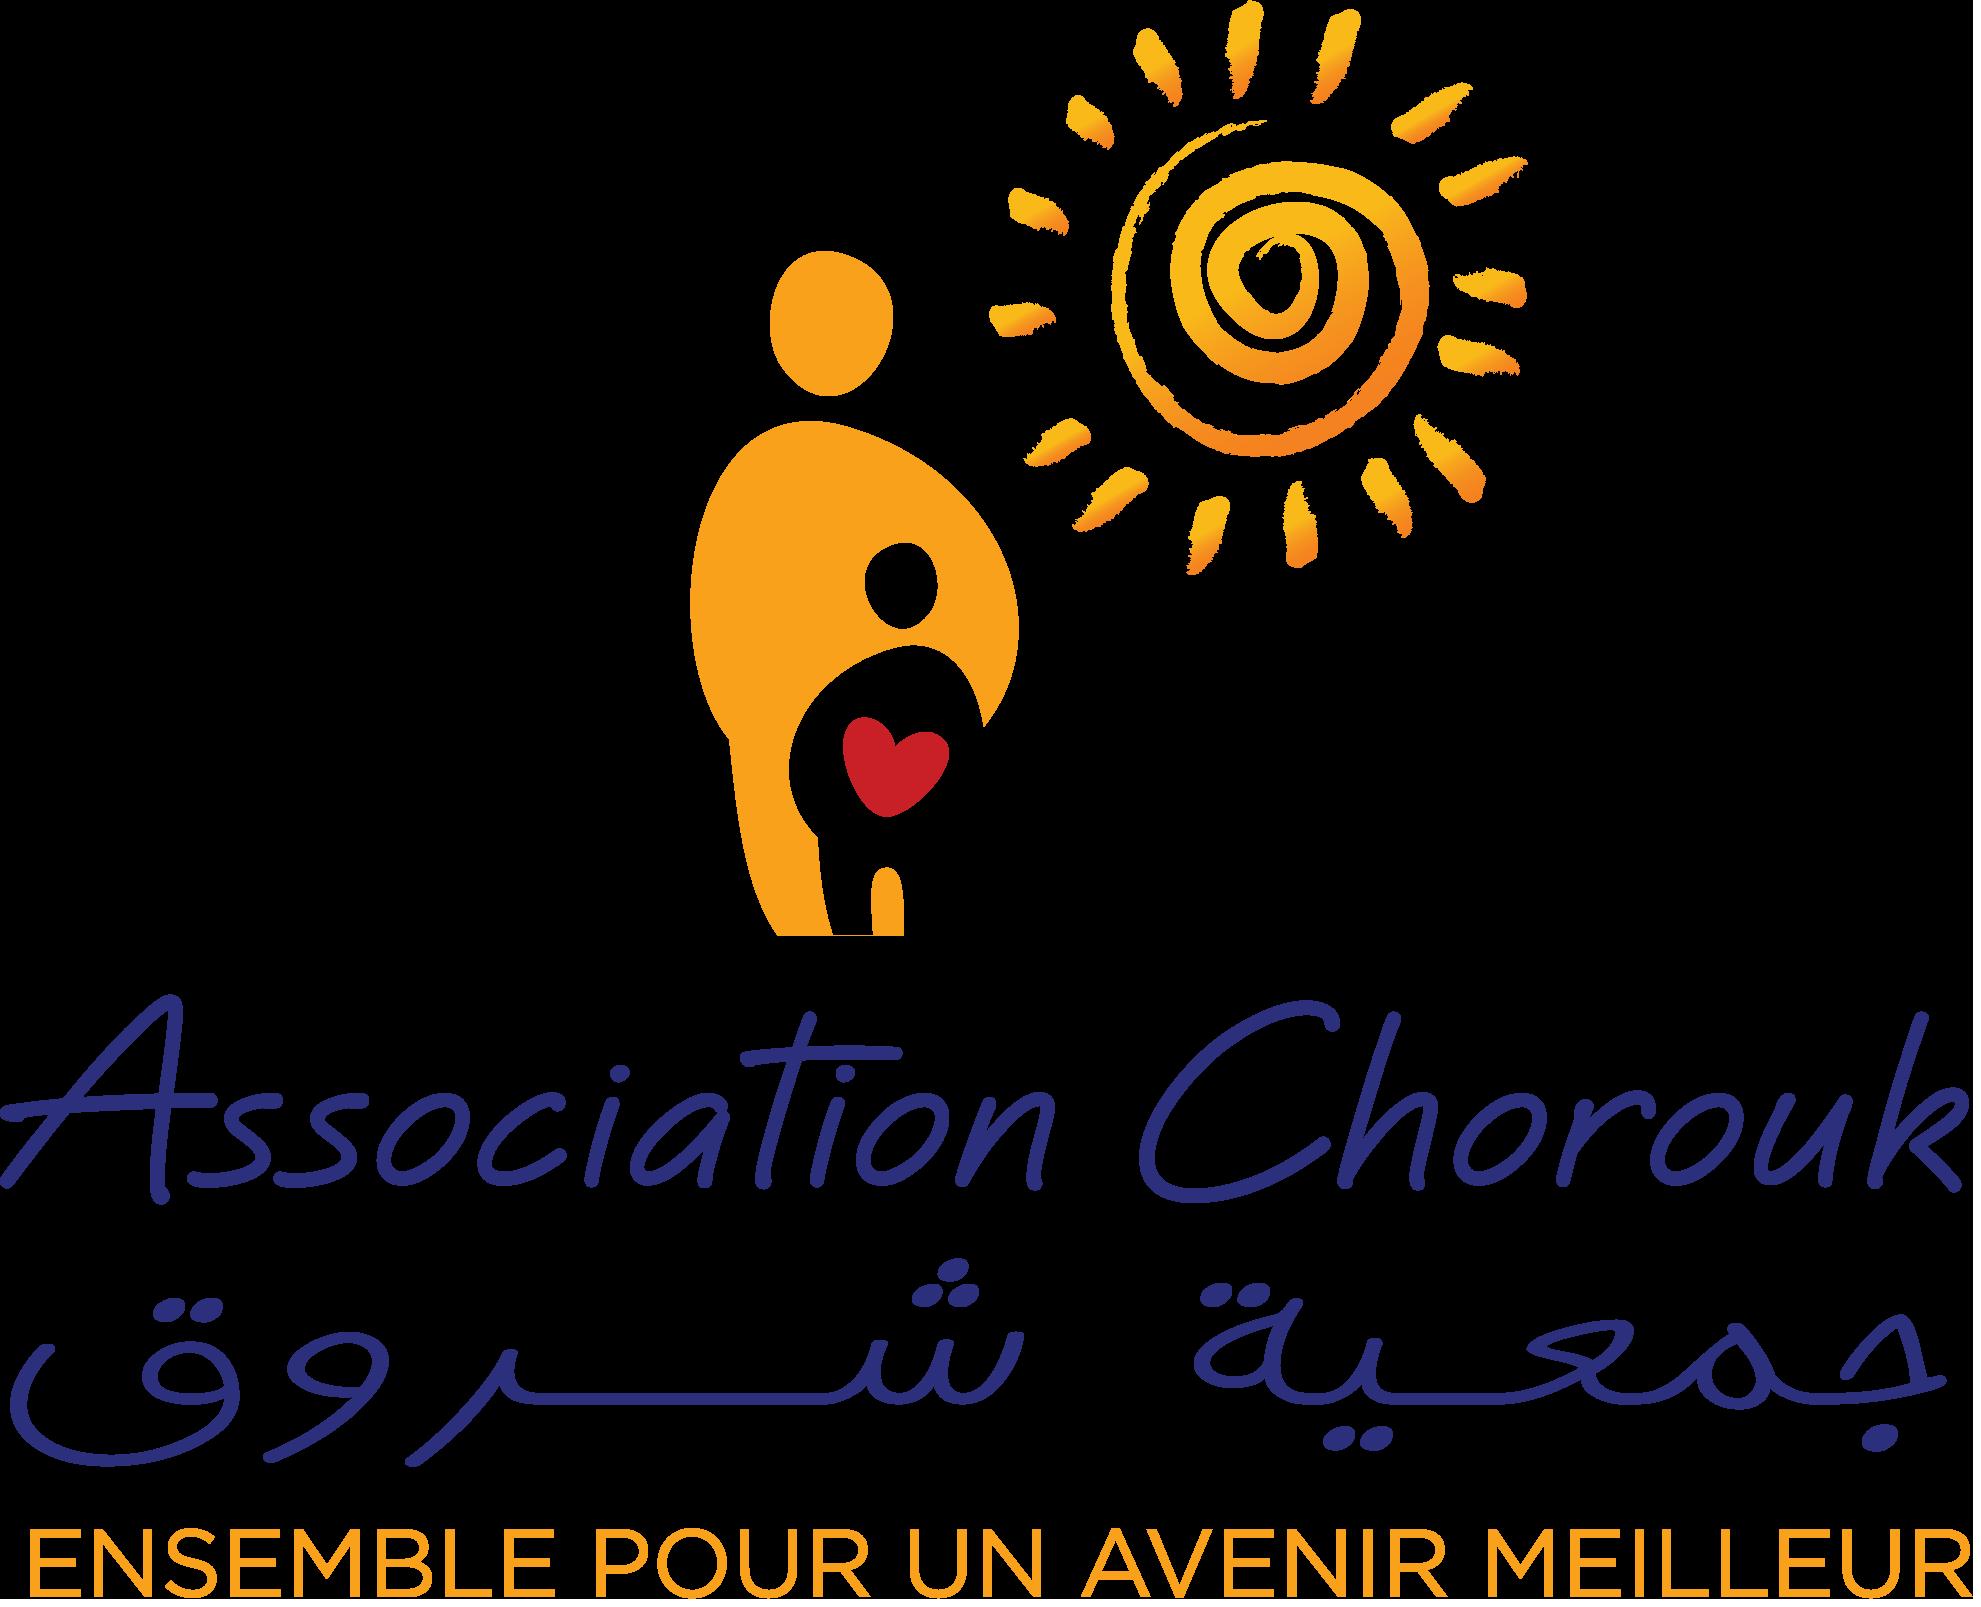 Association Chorouk